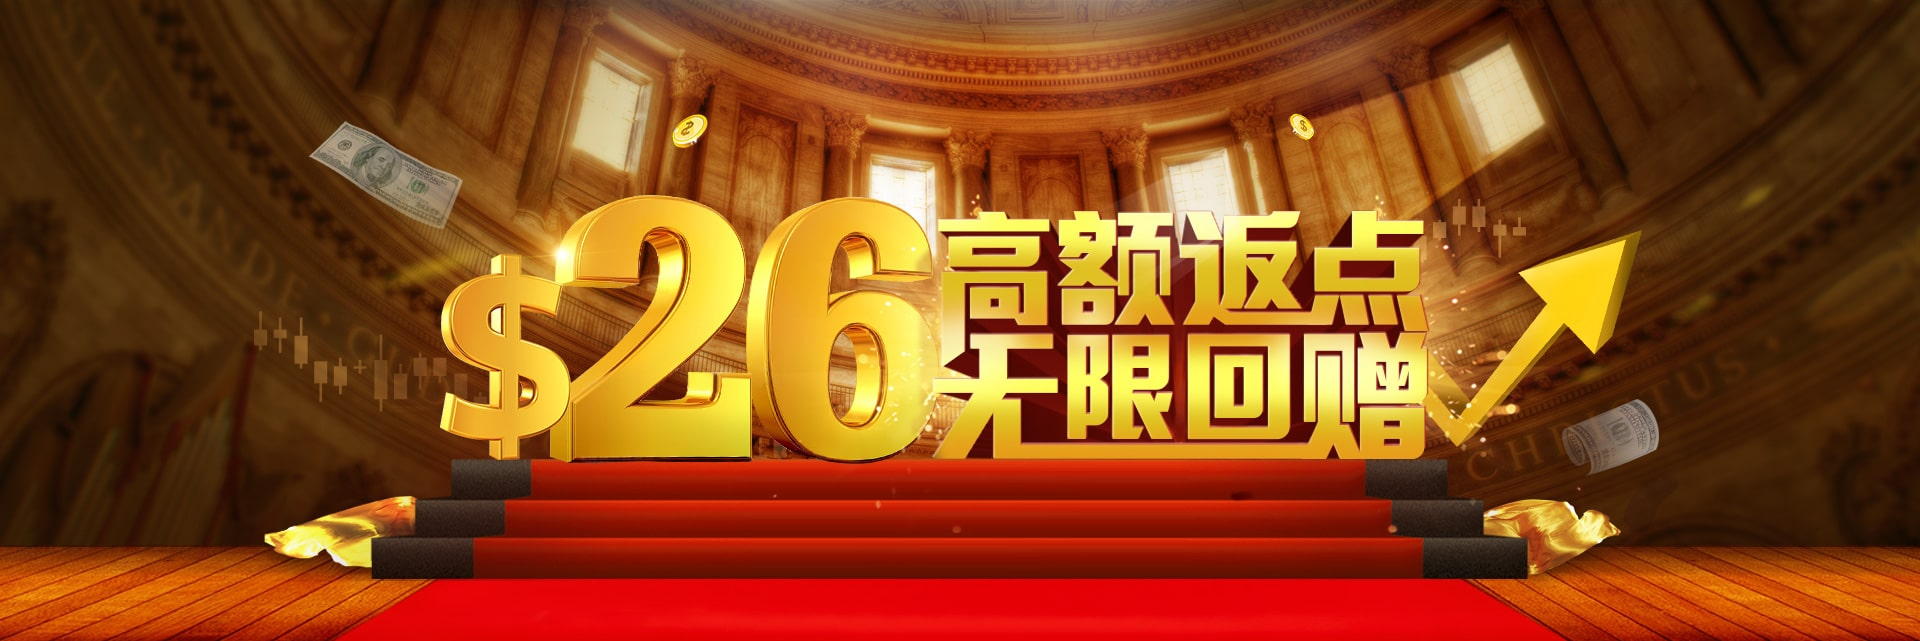 igold HK - $26 USD rebate (In Chinese)